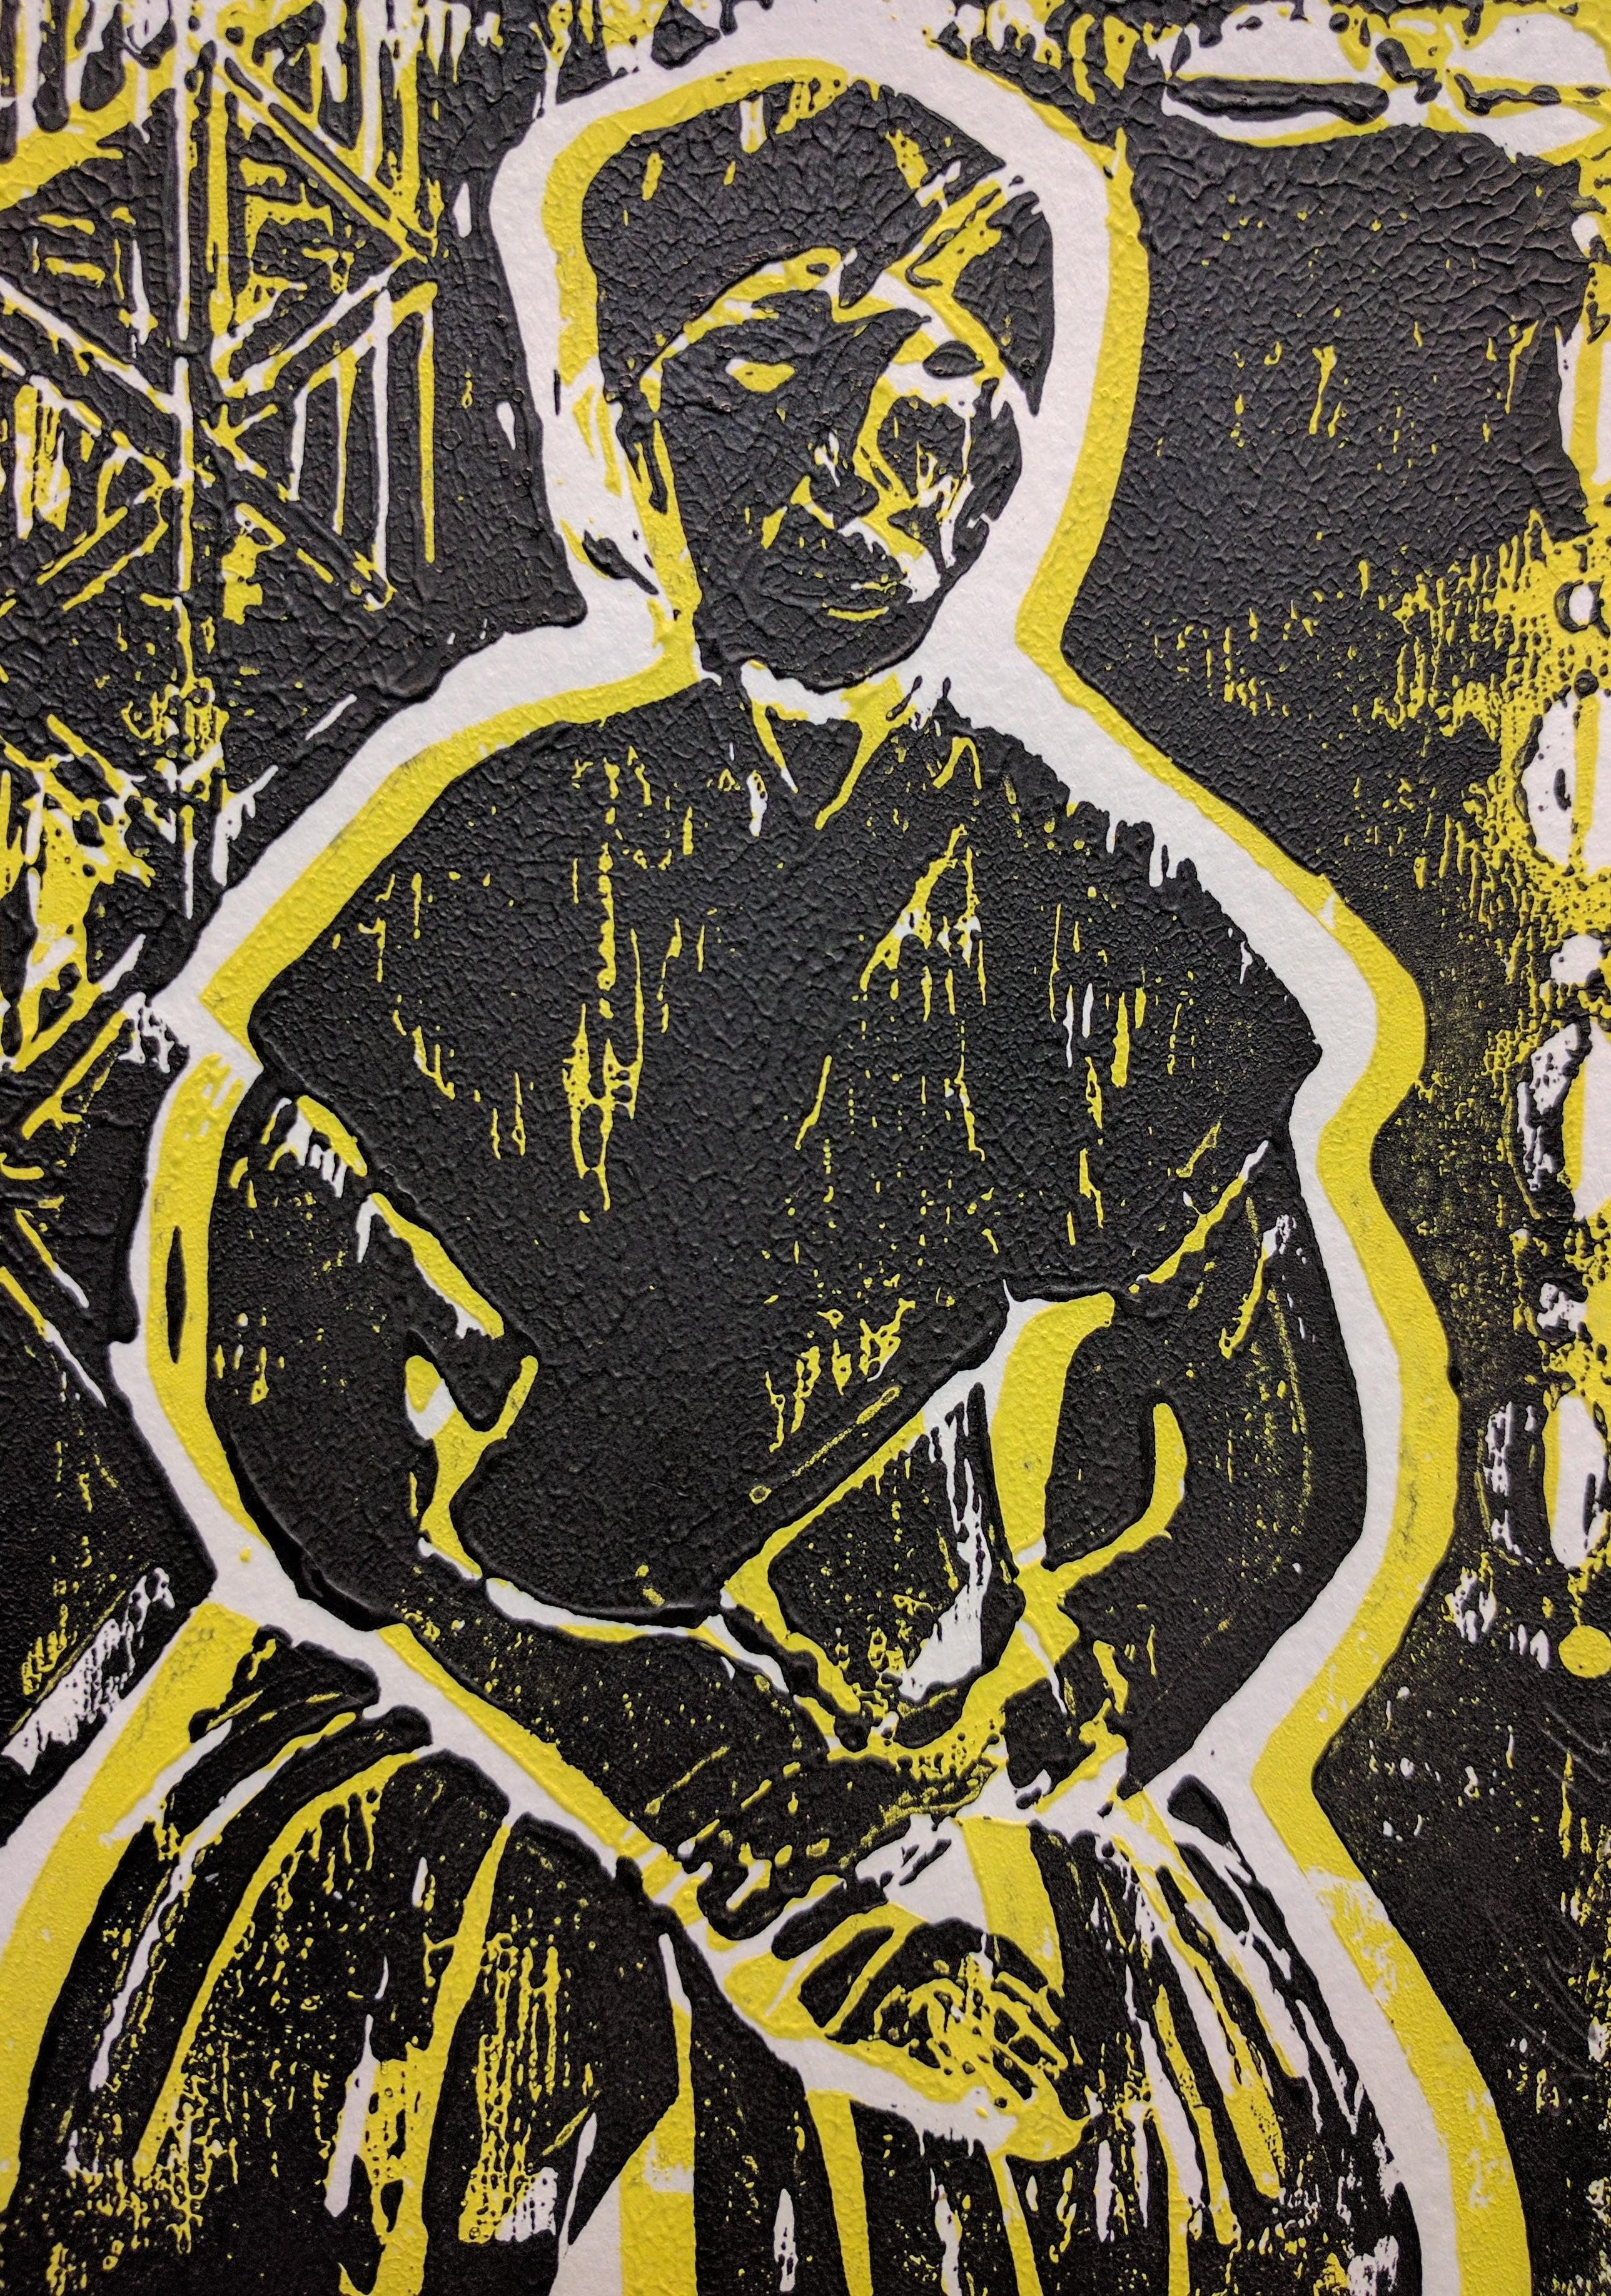 Linoleum block print by Alisea Williams McLeod